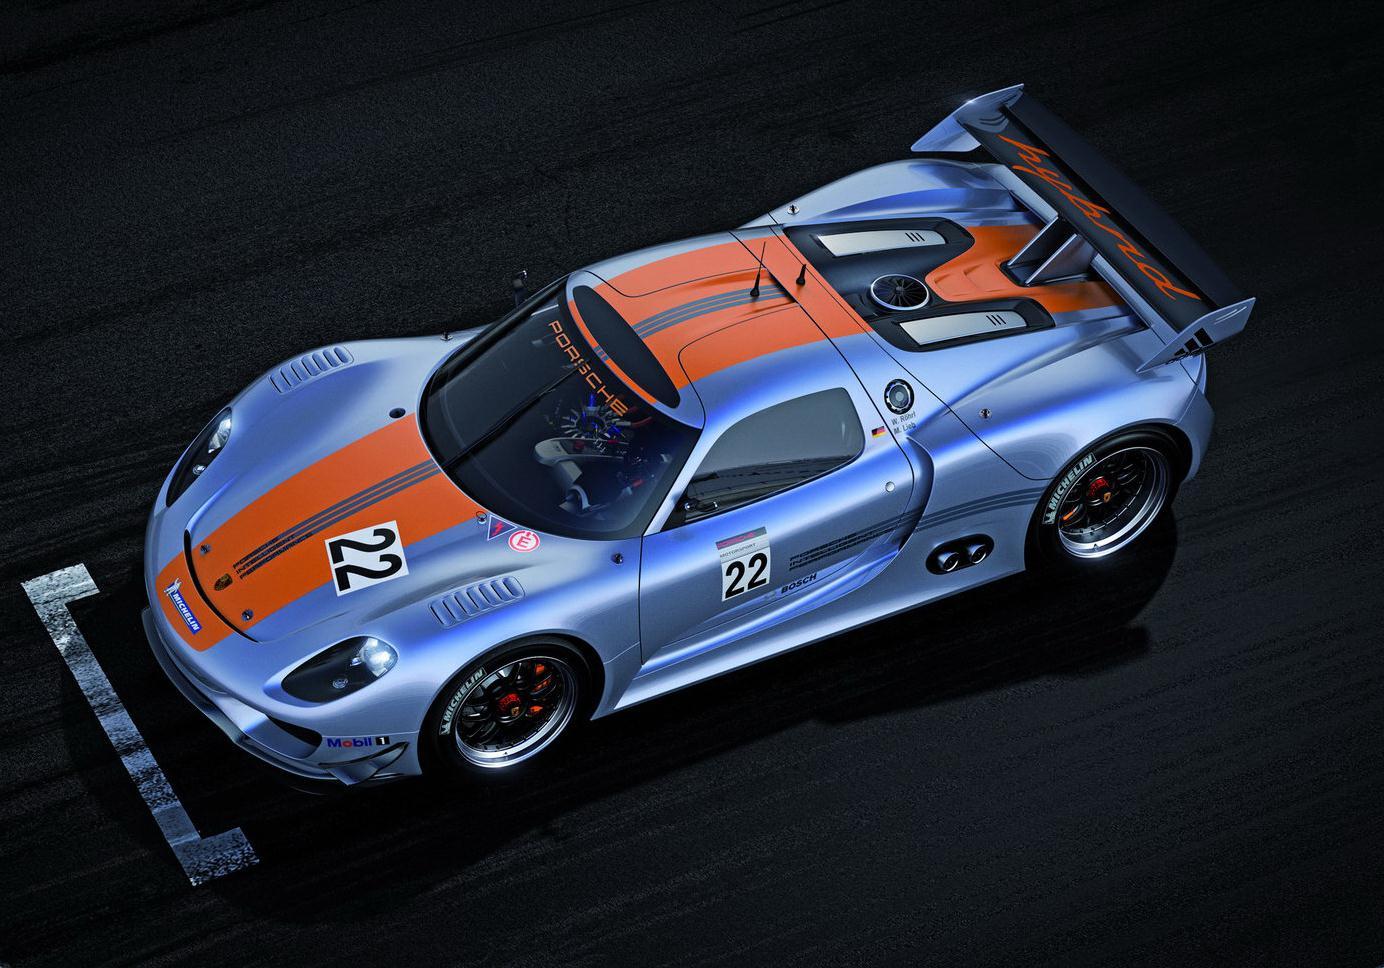 Porsche Working On Mid-engined Ferrari Fighter: Report